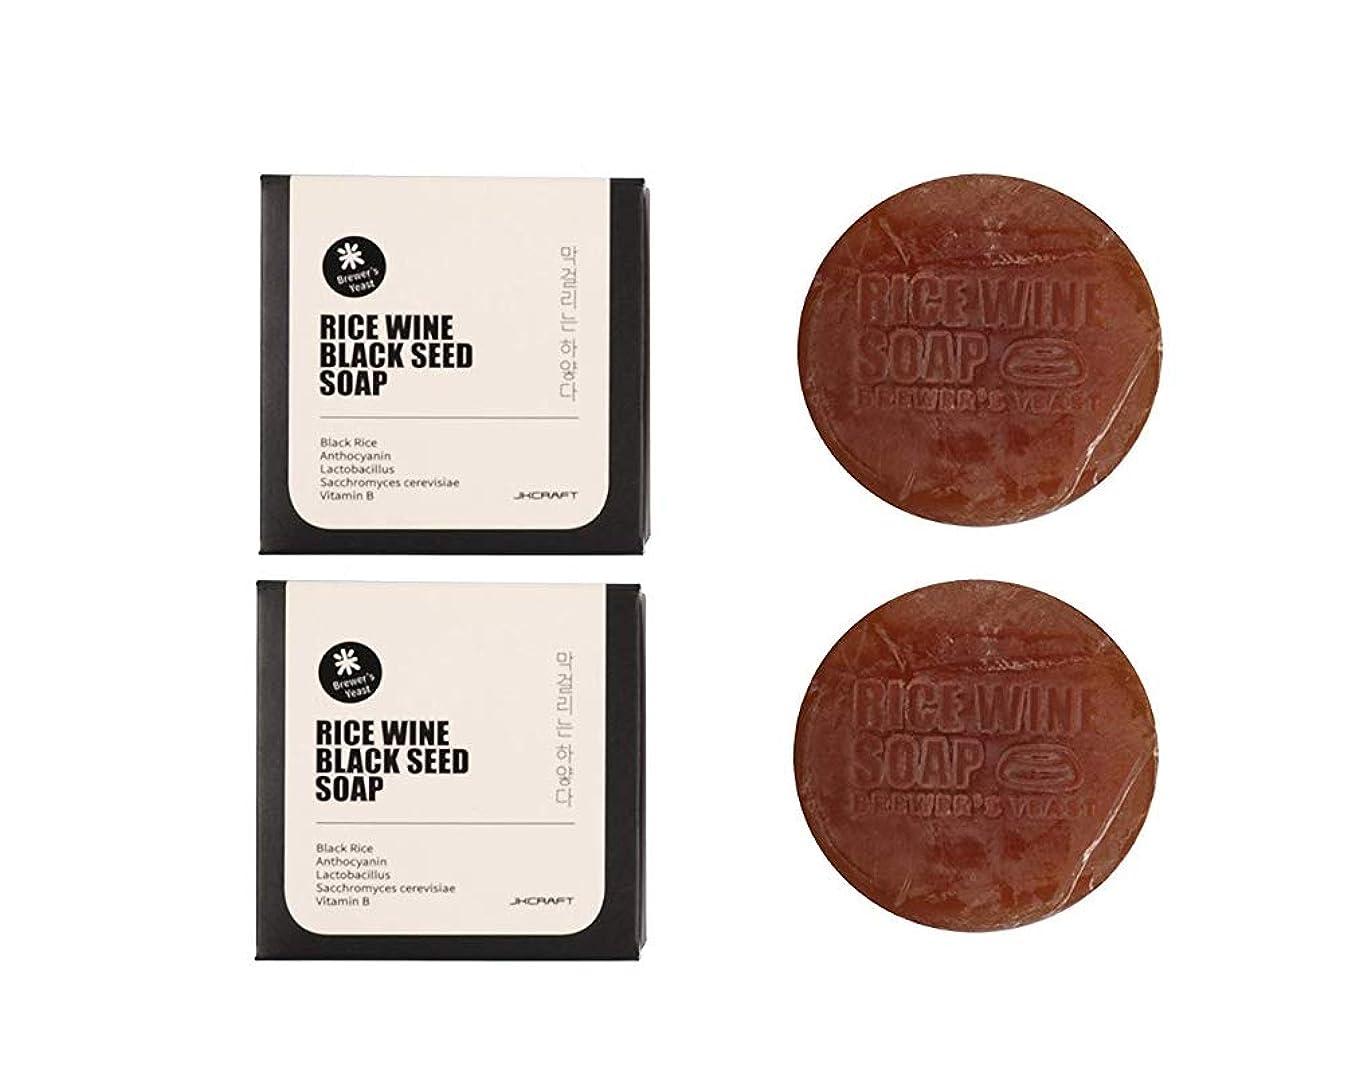 思春期シート織機JKCRAFT RICEWINE BLACK SEED SOAP 黒米マッコリ酵母石鹸,無添加,無刺激,天然洗顔石鹸 2pcs [並行輸入品]